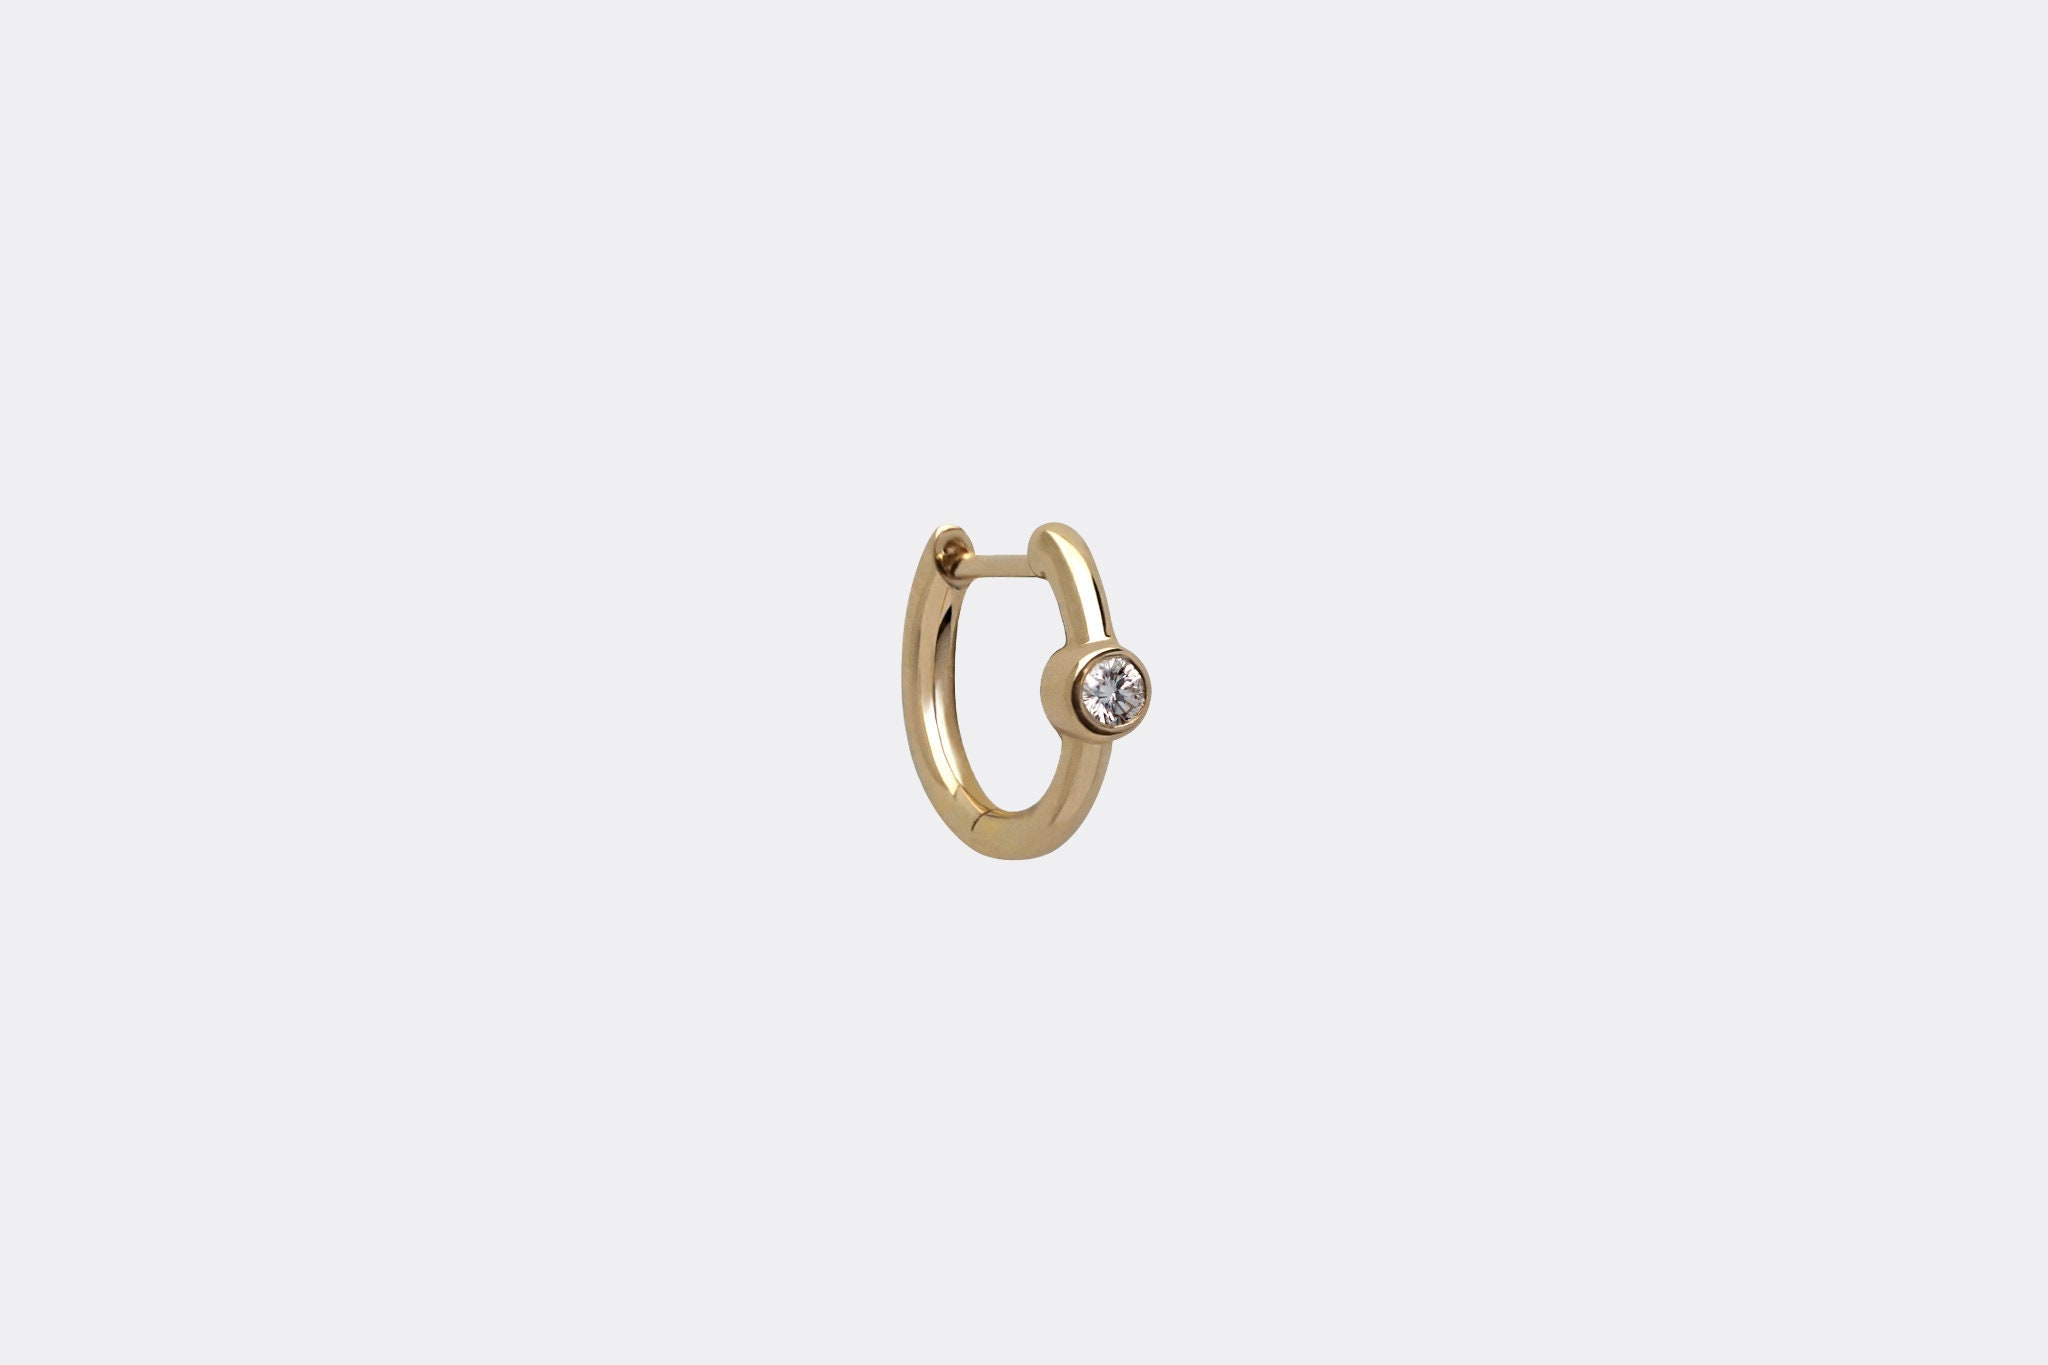 14k Tiny Diamond Hoop Earrings Size 10mm Ear Hugging Hoop Mini